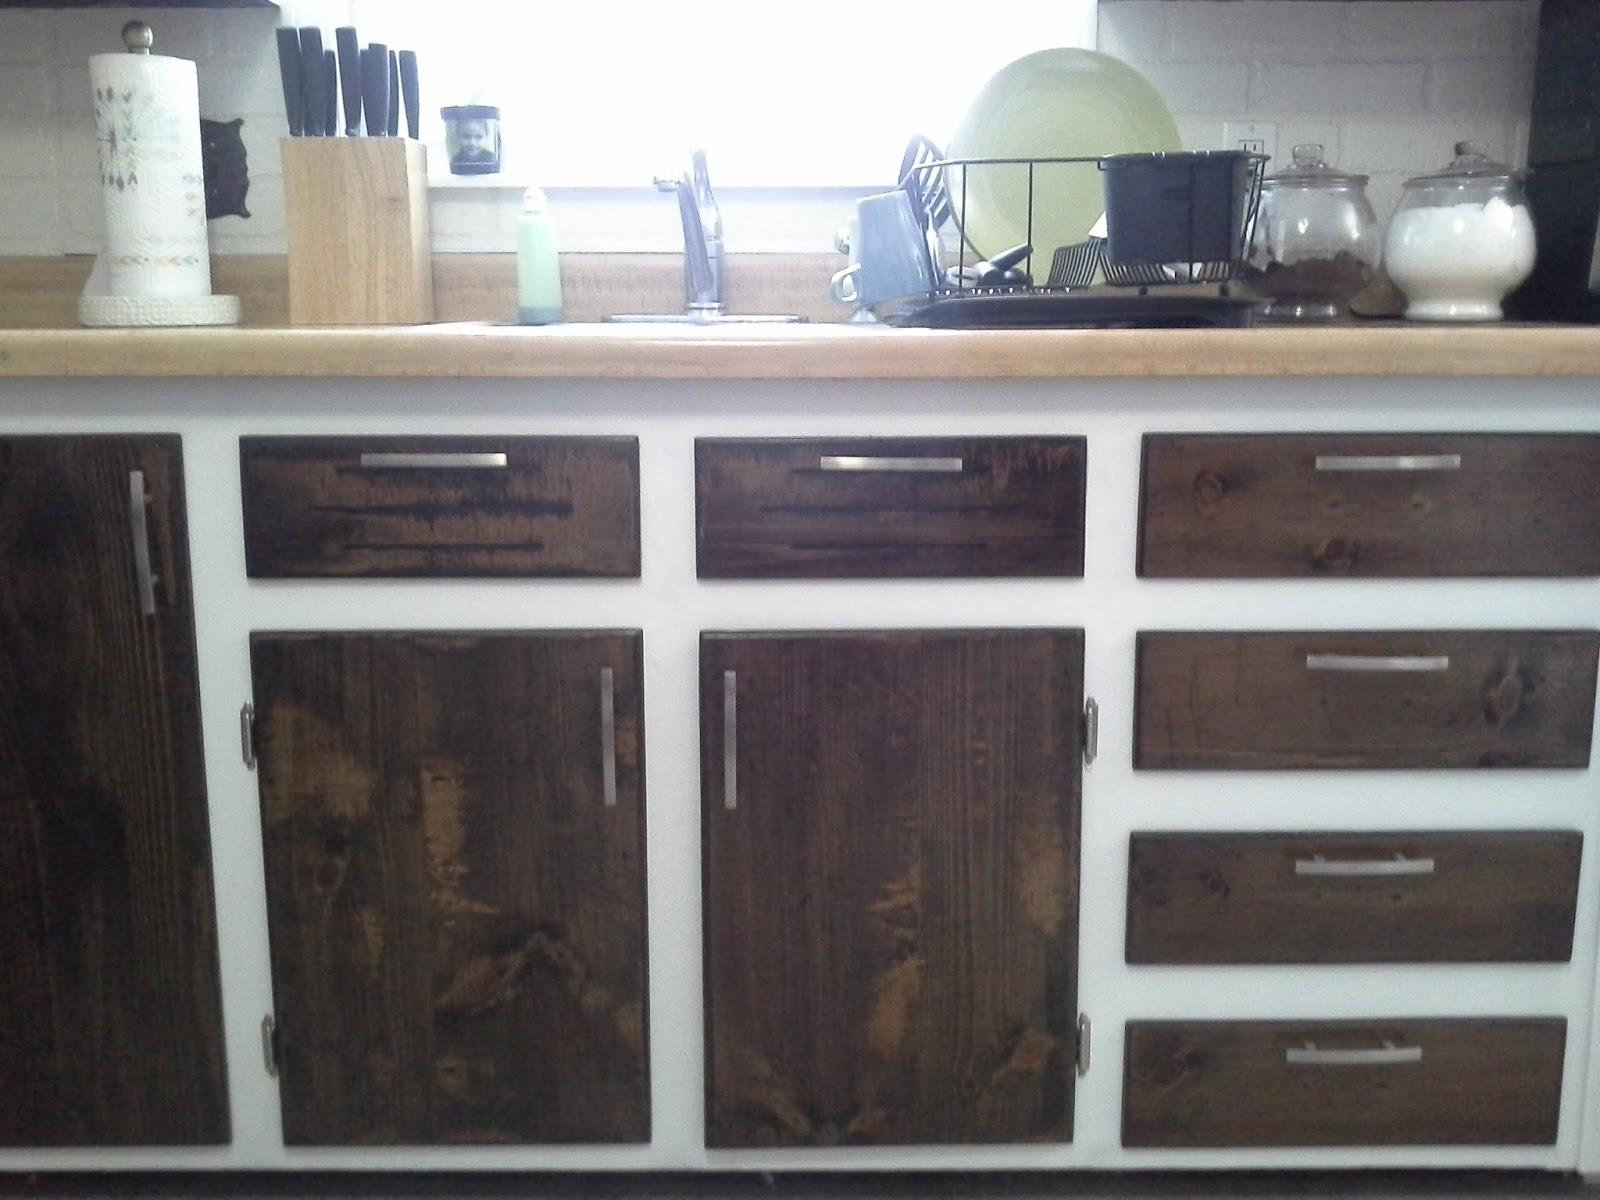 Kitchen Cupboard Makeover Lillys Home Designs Kitchen Cabinet Makeover Reveal